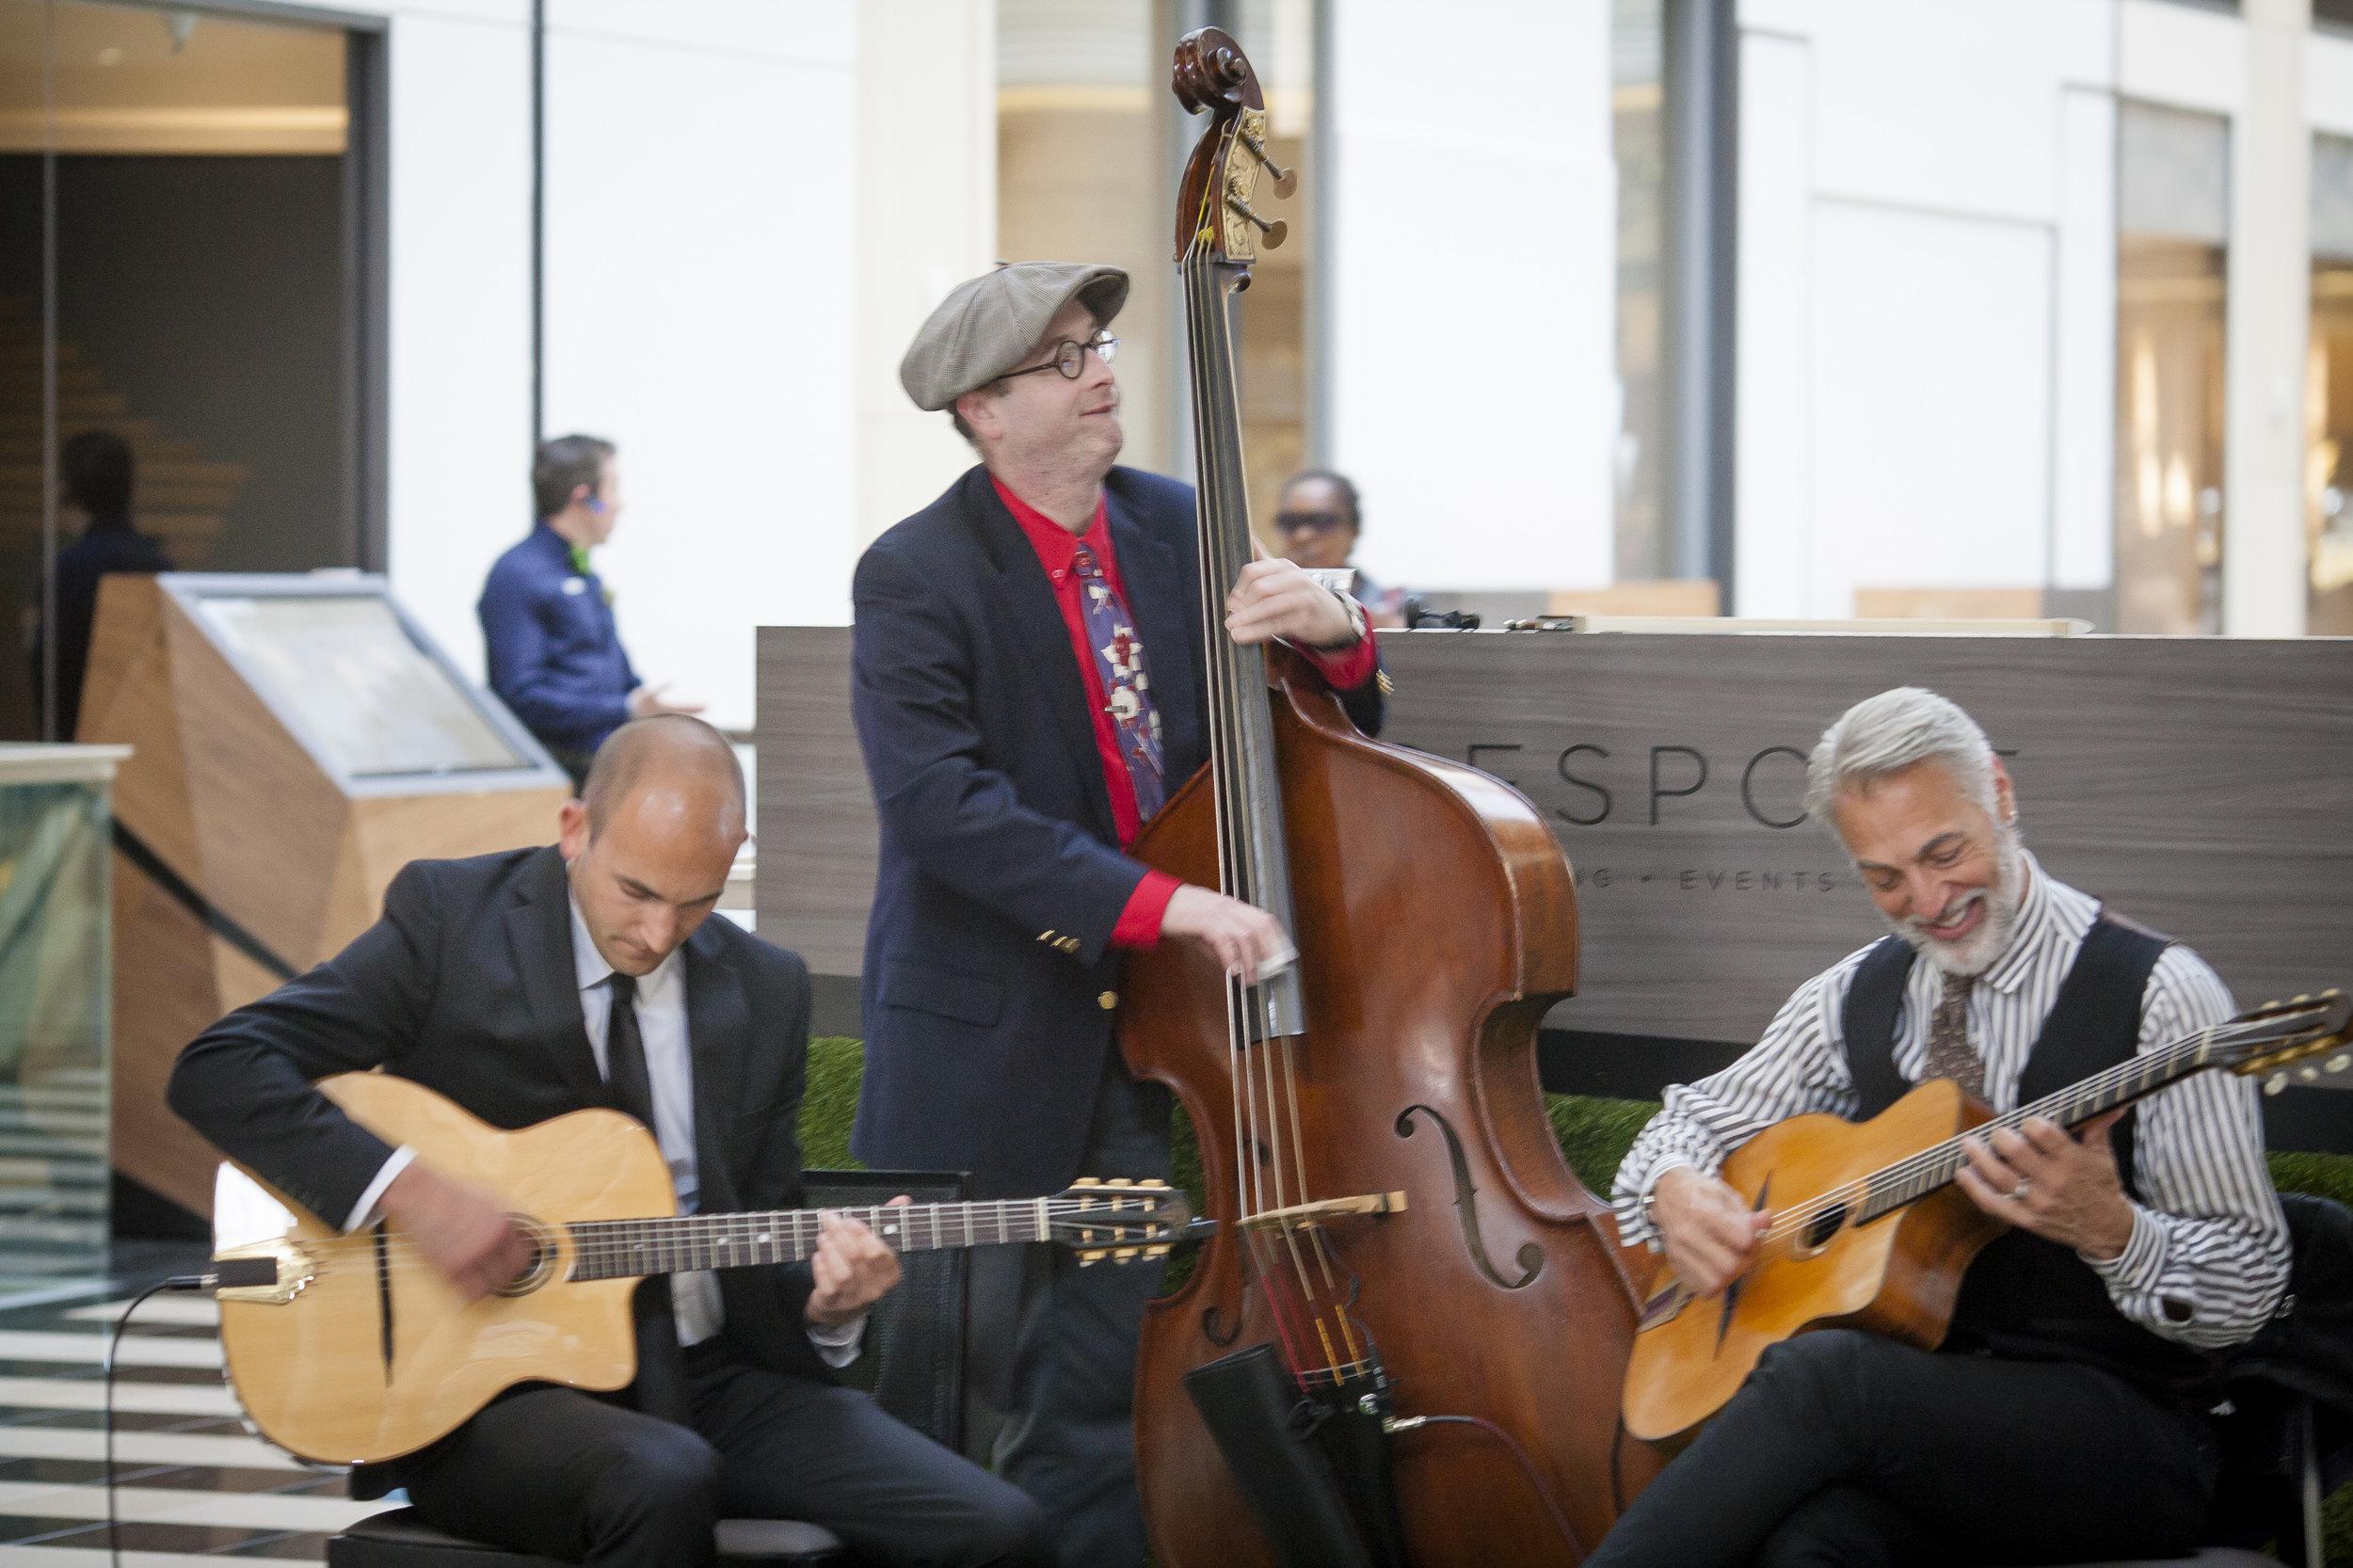 Le Jazz Hot Band- Bespoke San Francisco